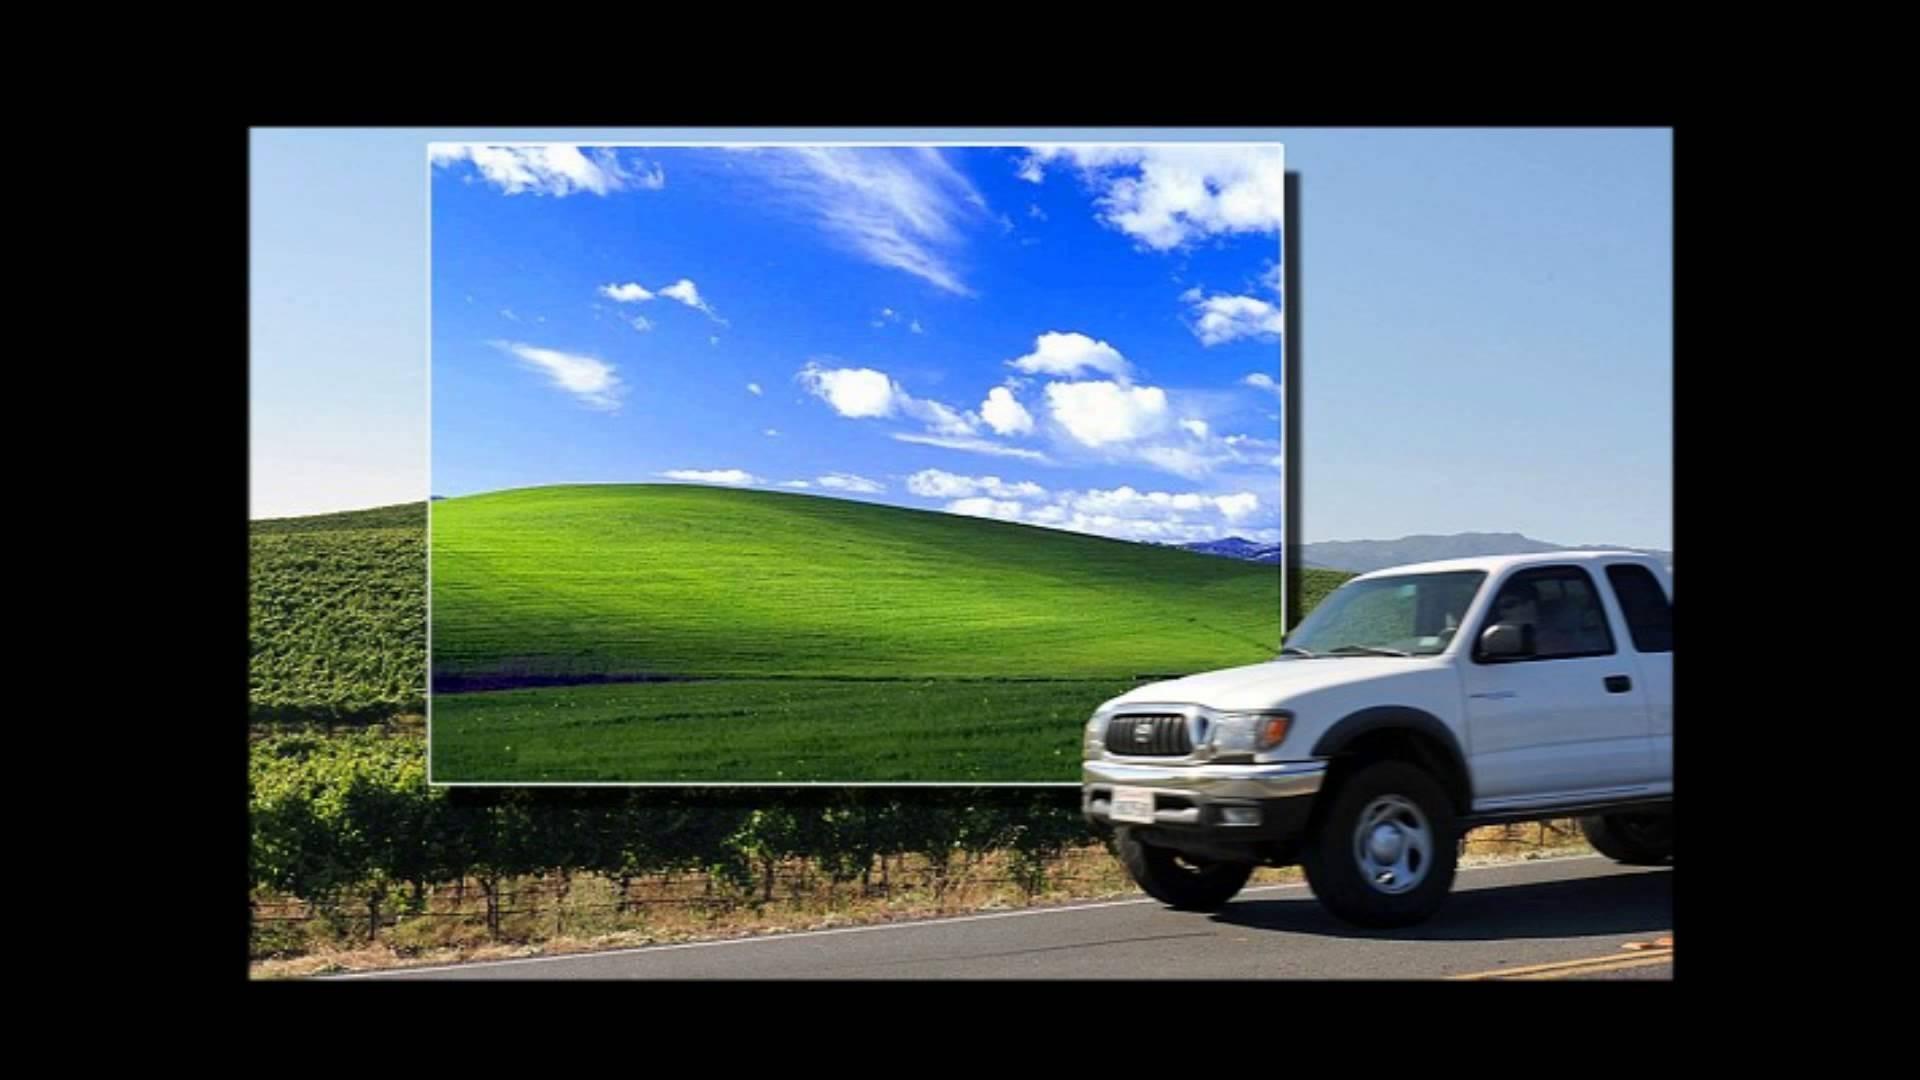 windows xp background 183�� download free stunning high